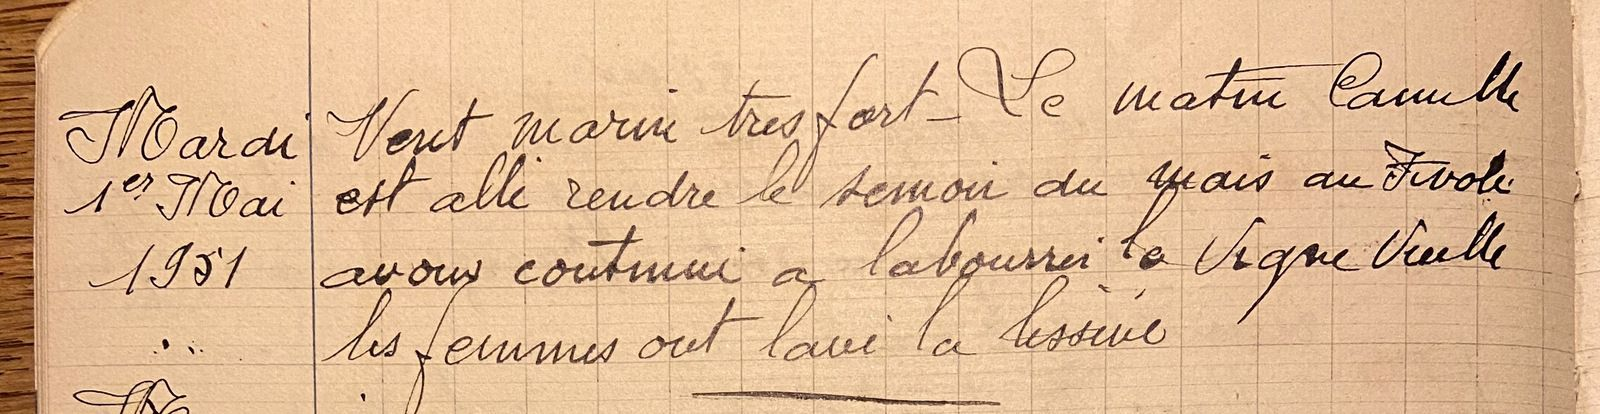 Mercredi 1er mai 1951 - le semoir à maïs